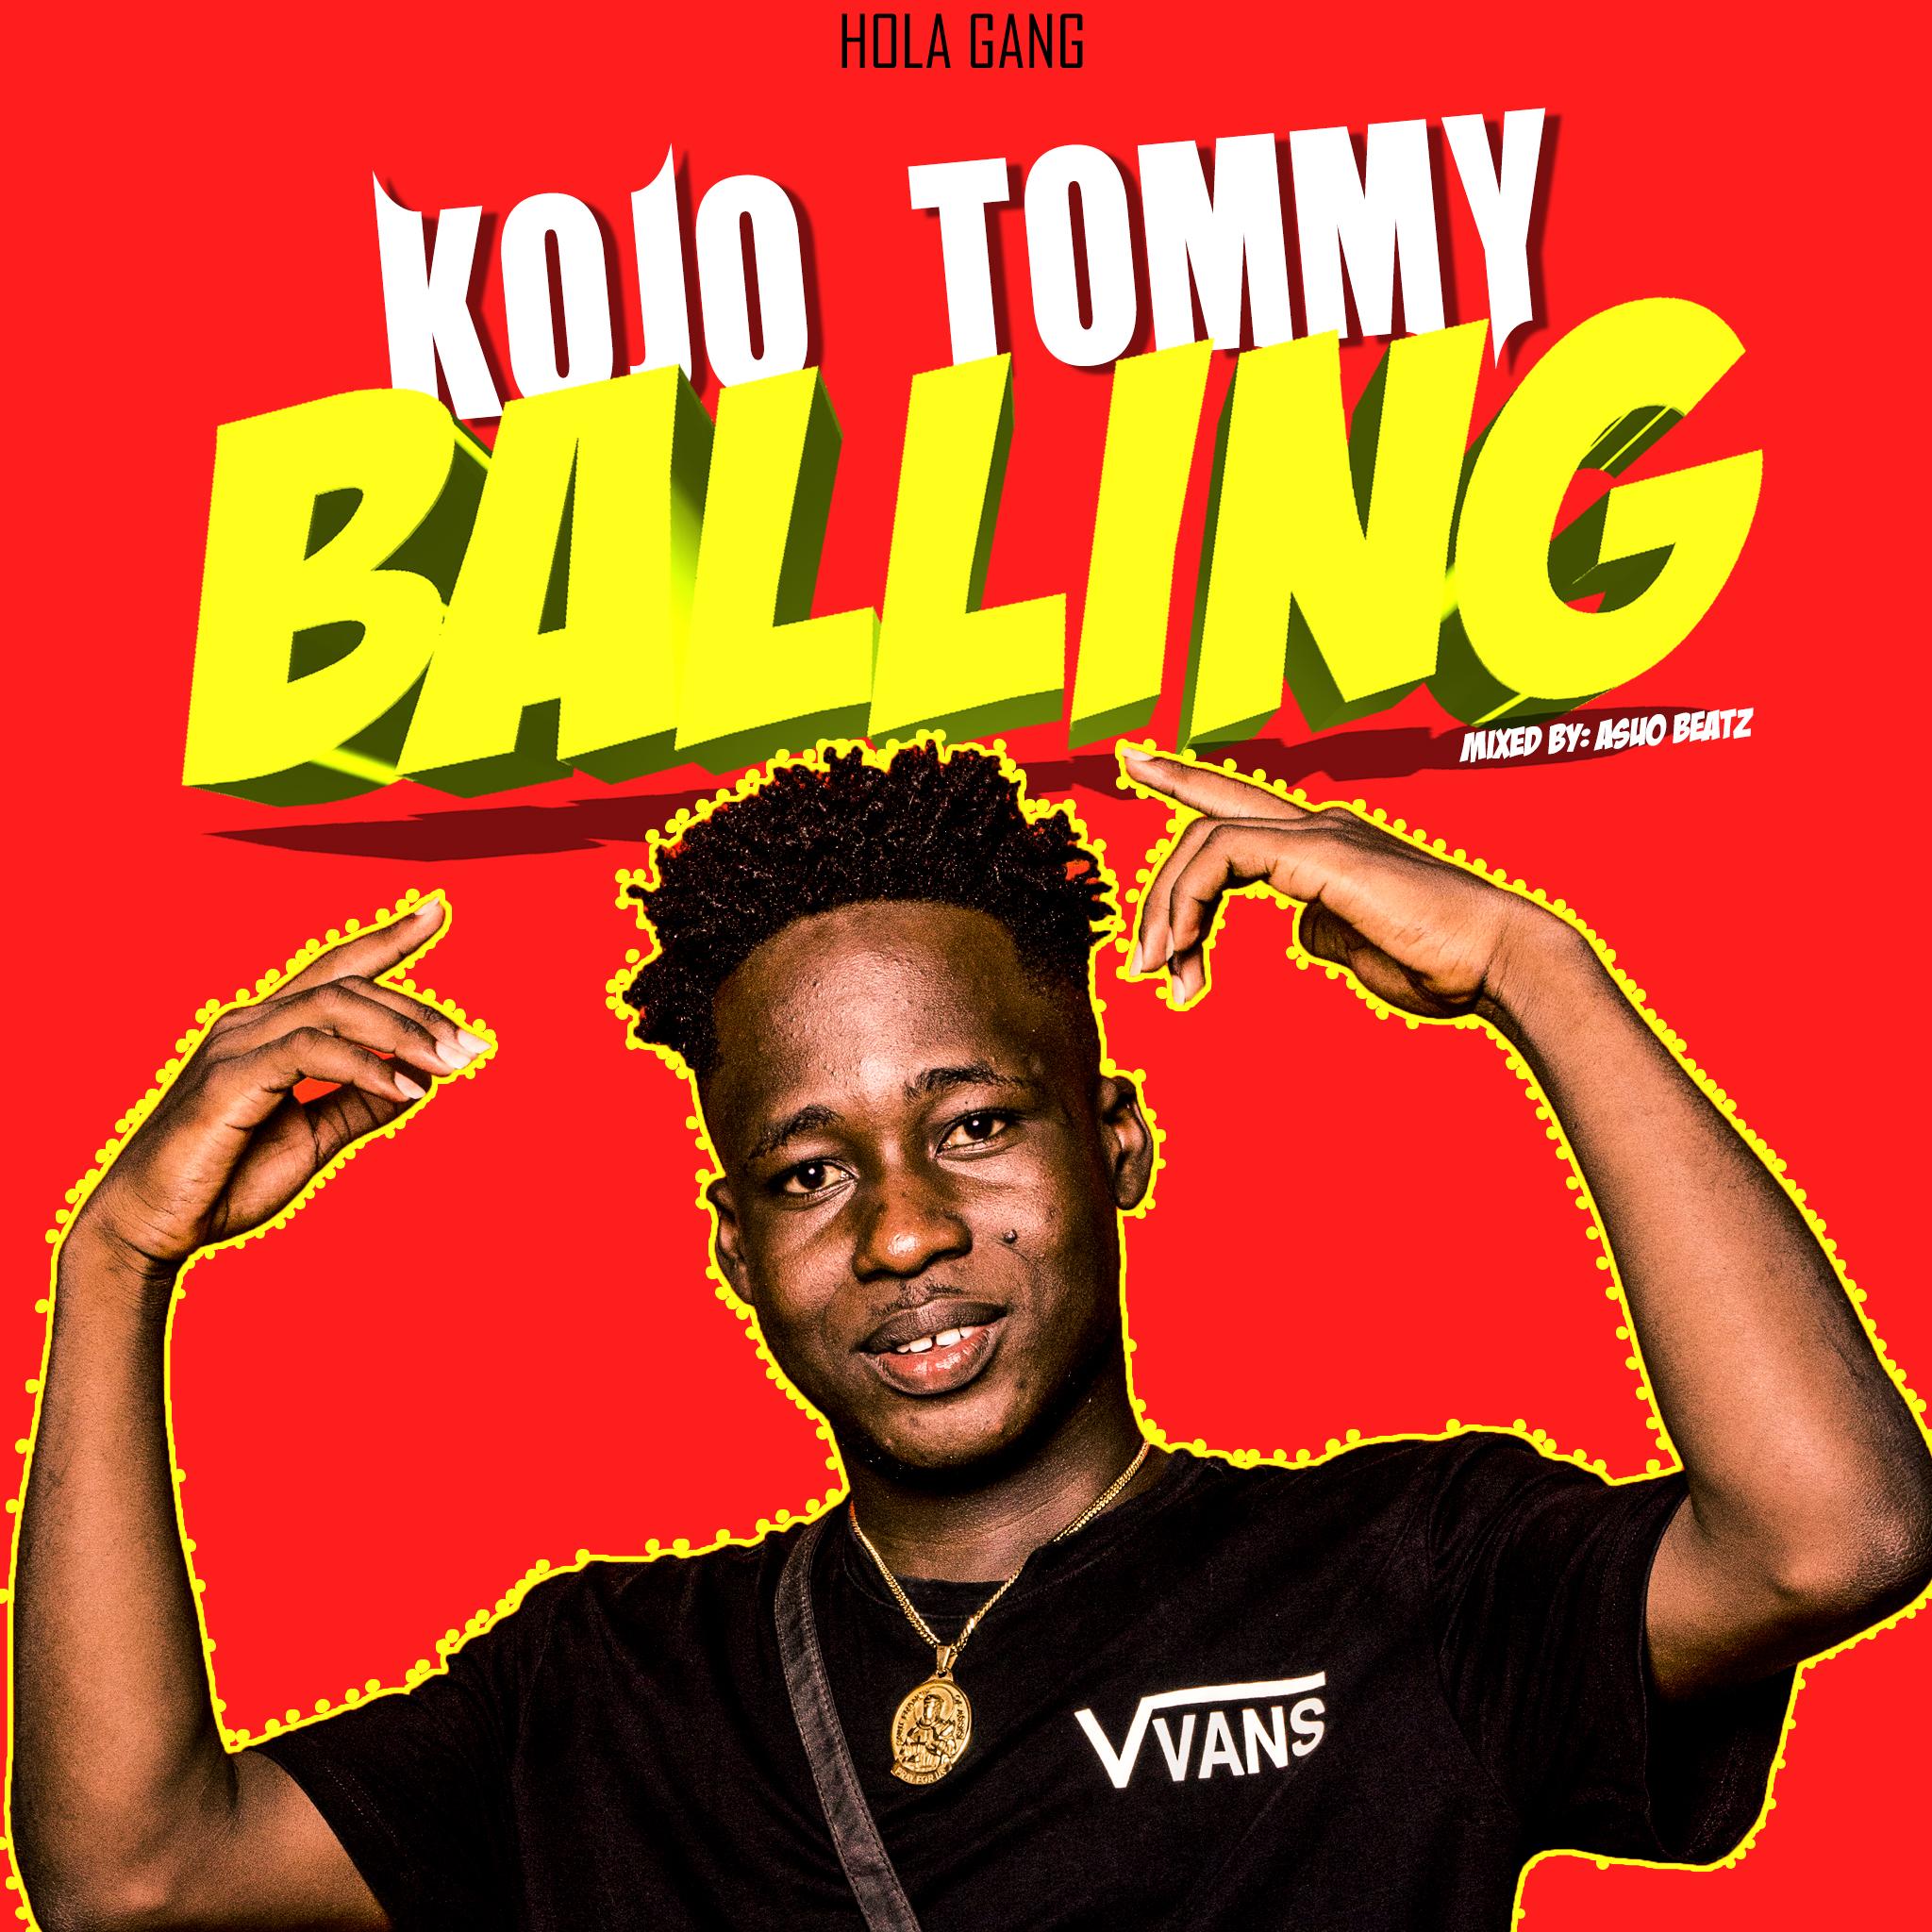 Kojo Tommy - Balling (Mixed By Asuo Beatz)